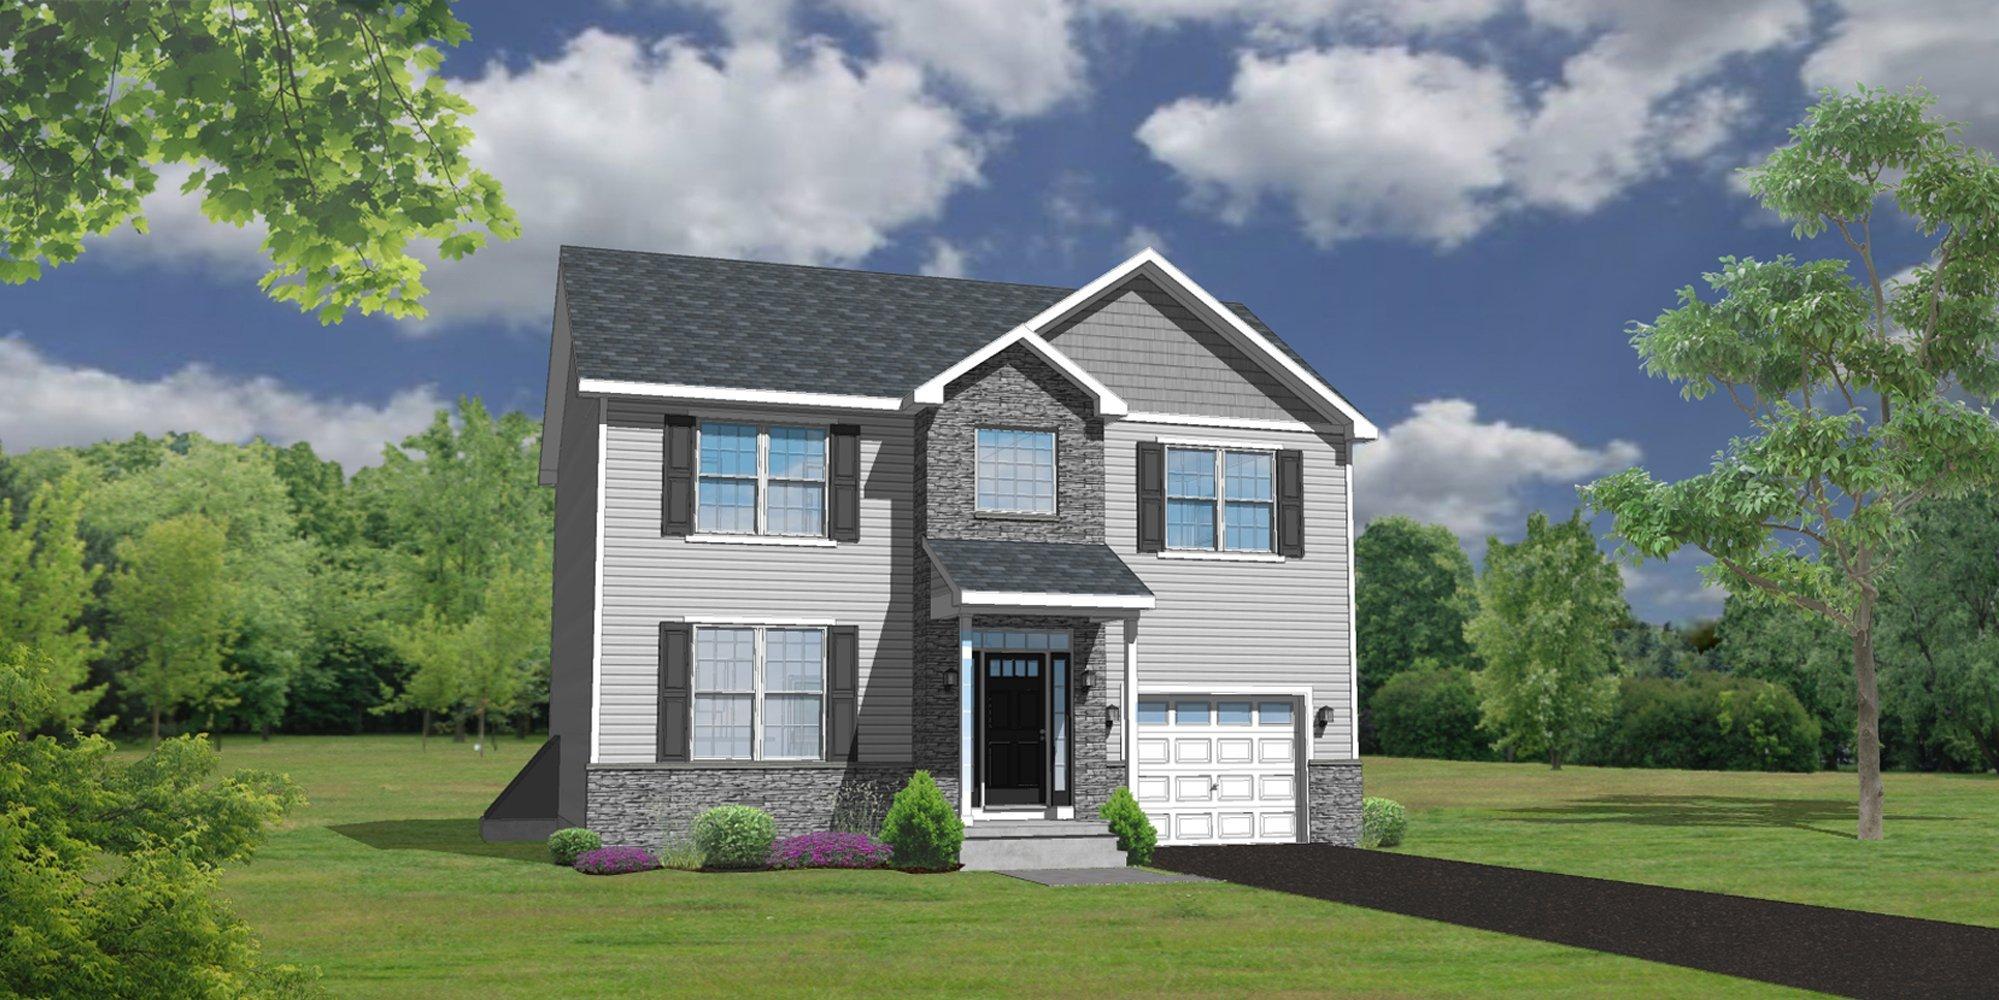 The Jonas Home Design Plan